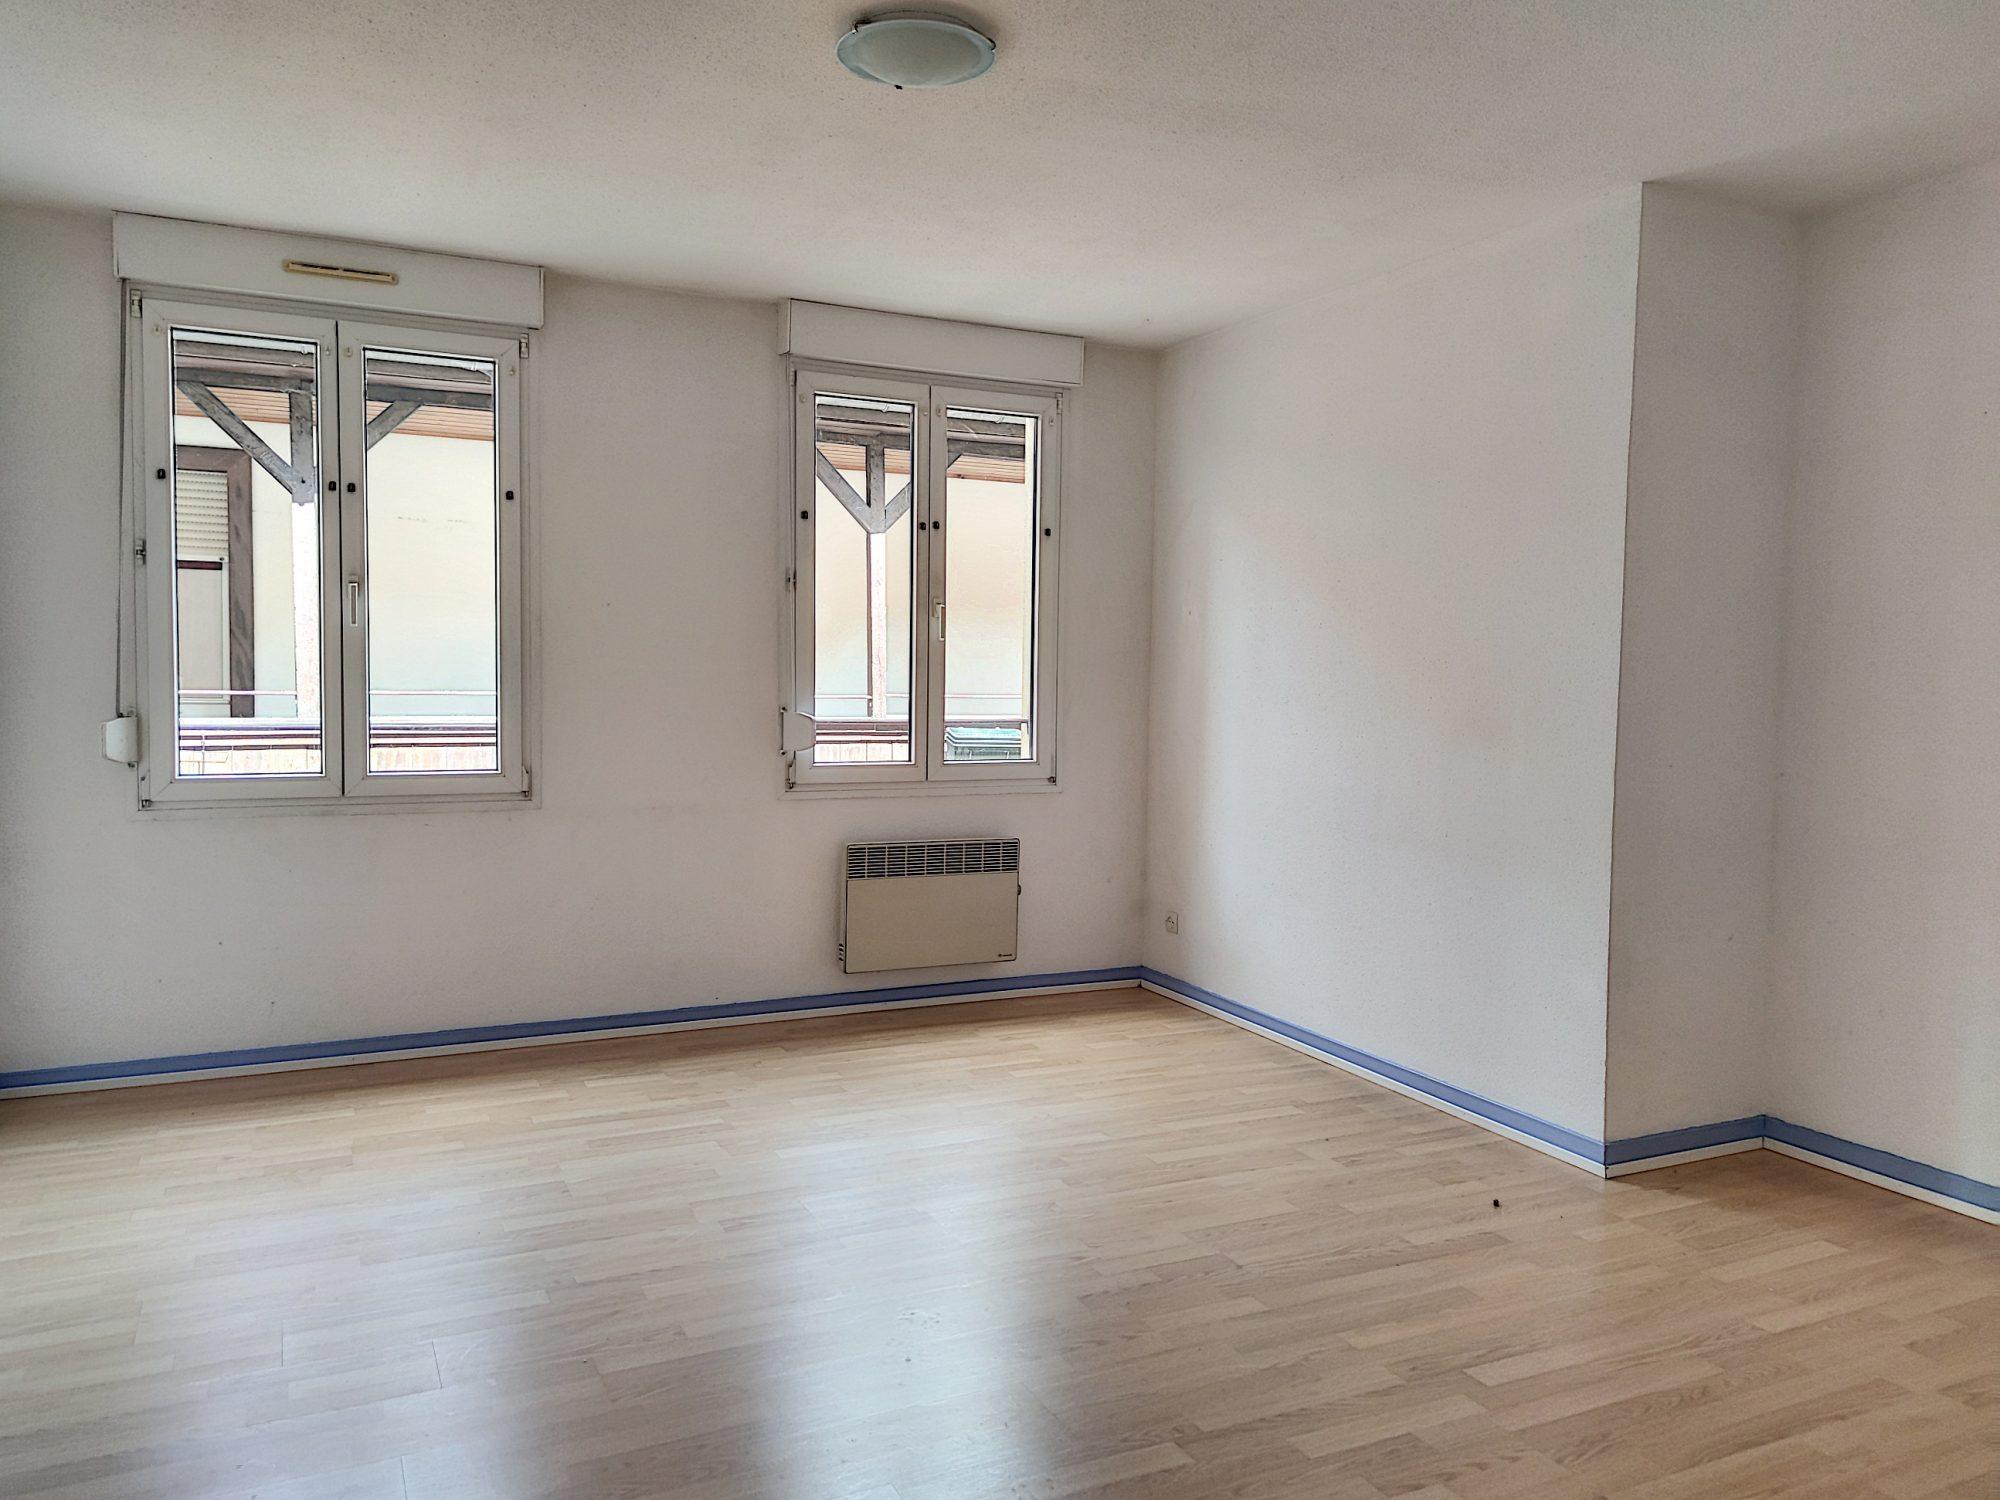 STRASBOURG GARE, 2 pièces, 55 m²